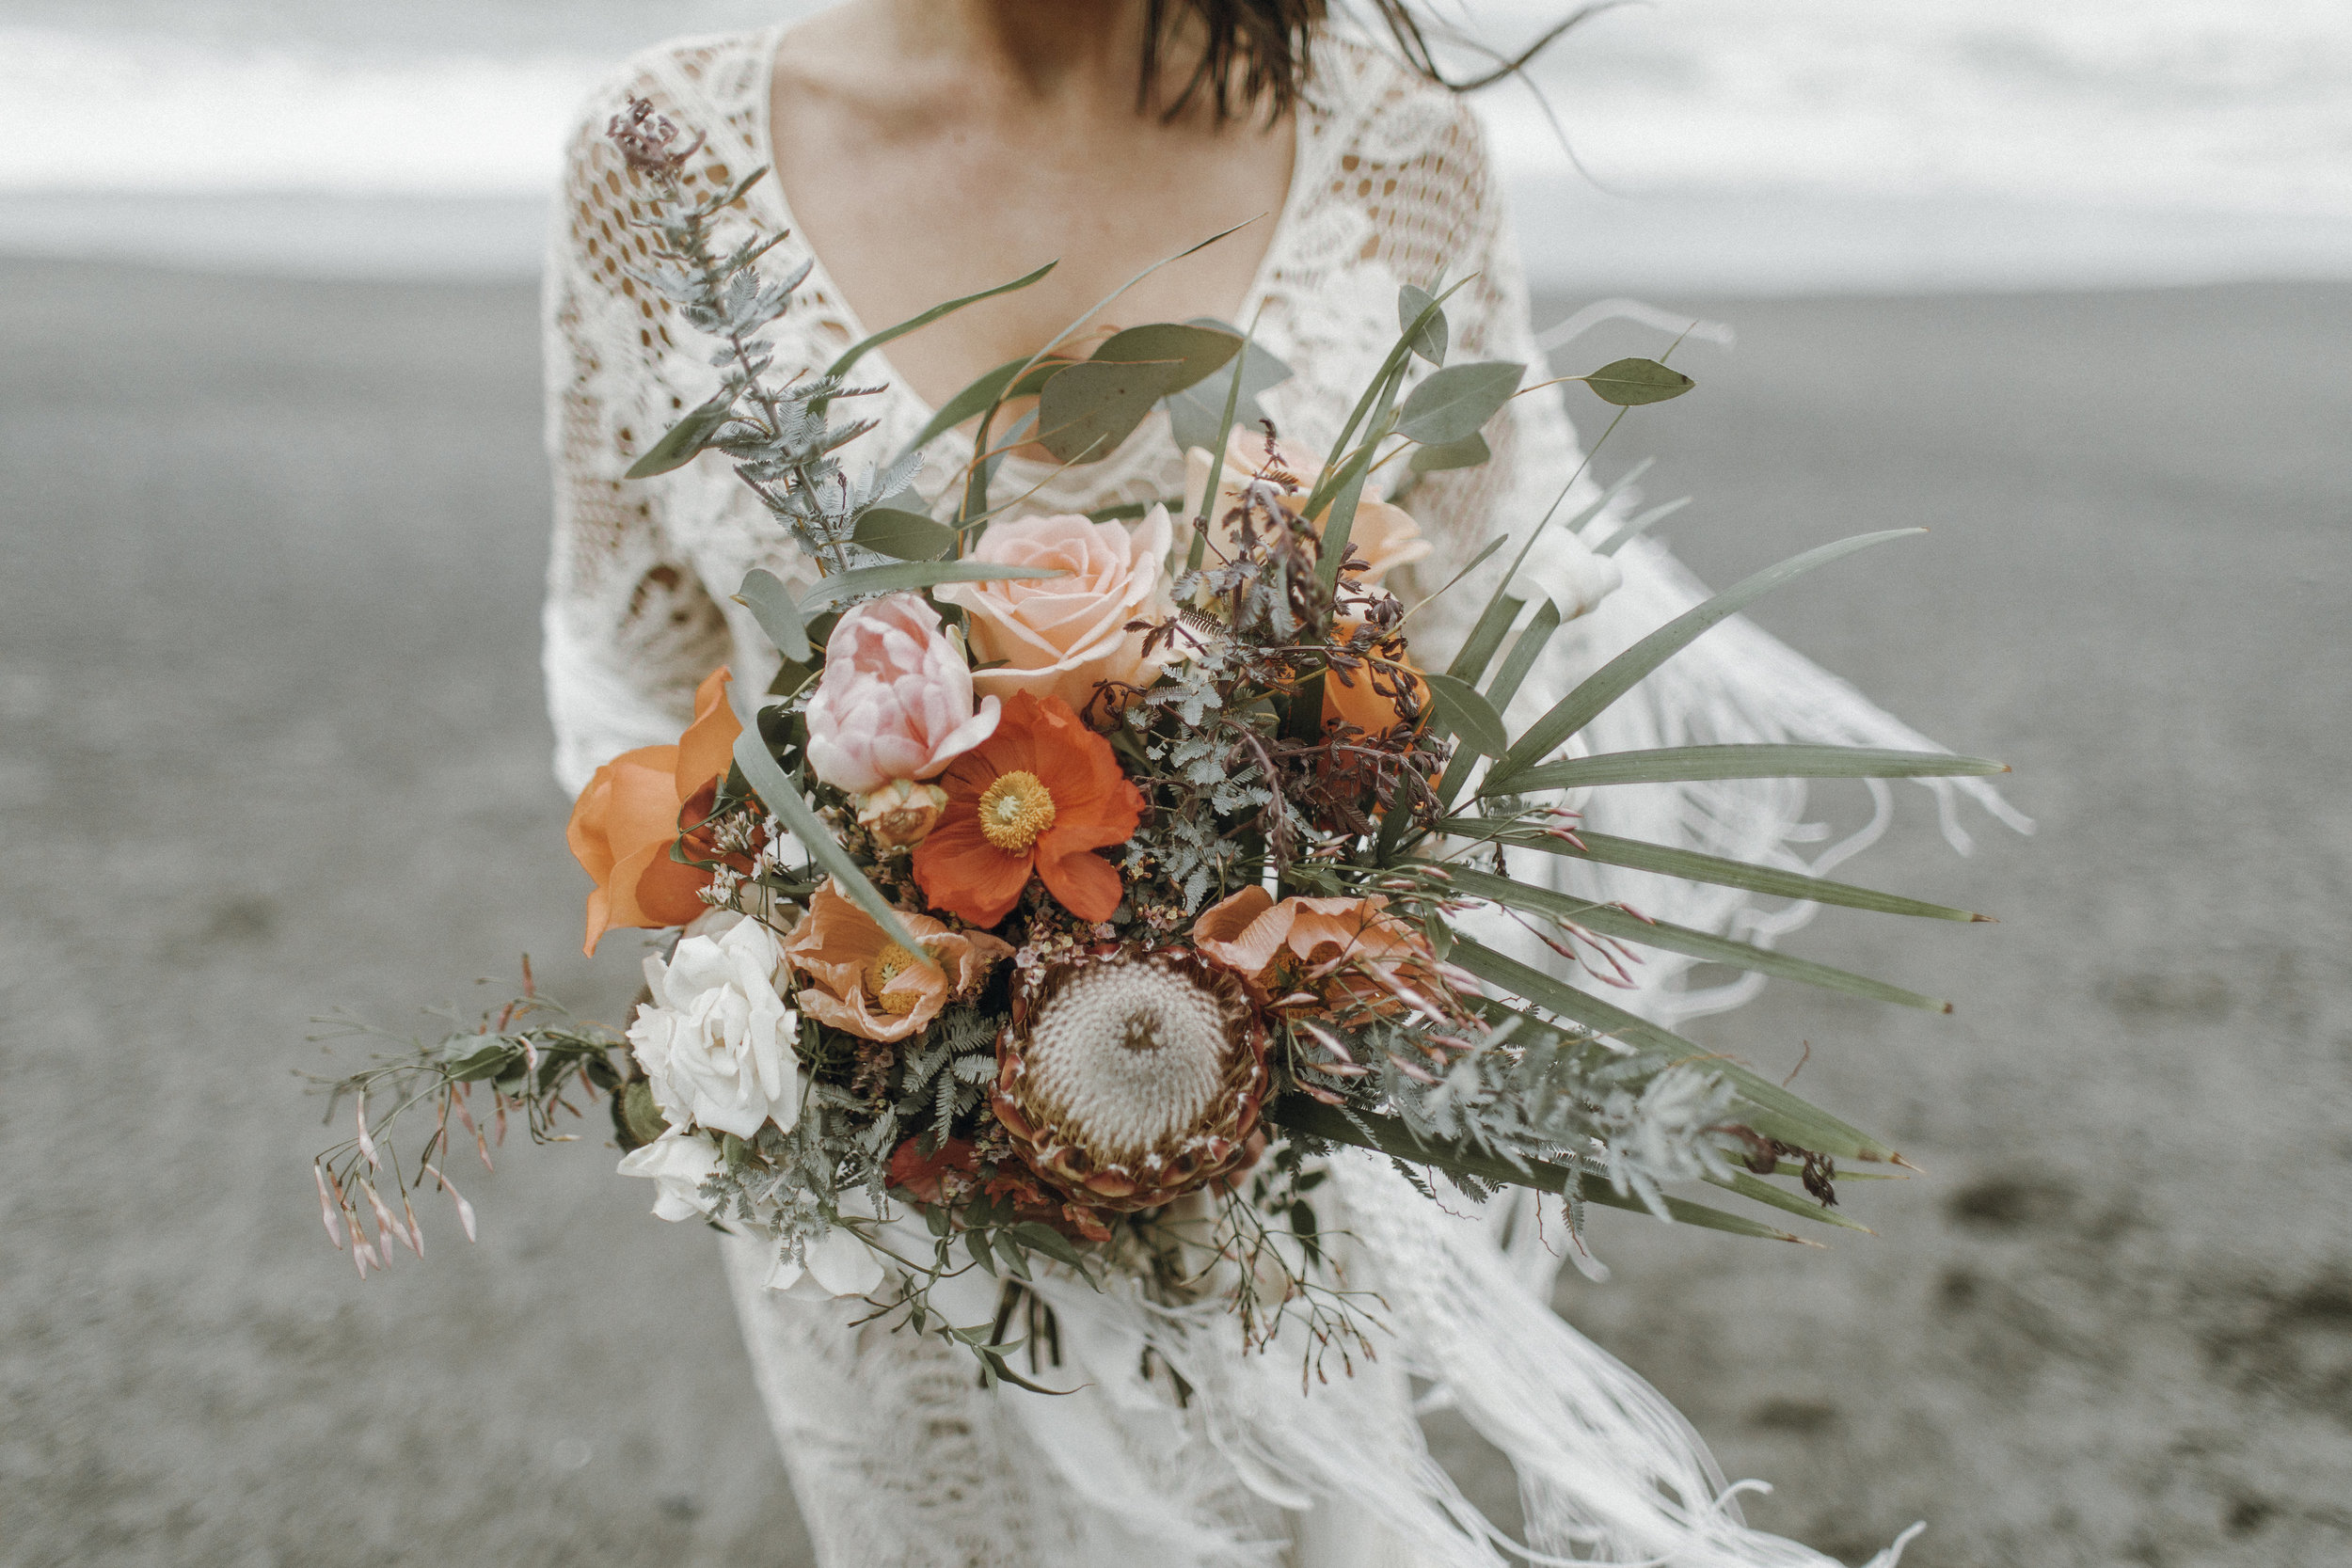 Ruby Beach Elopement - Photography & styling by Bonita Gabrielle